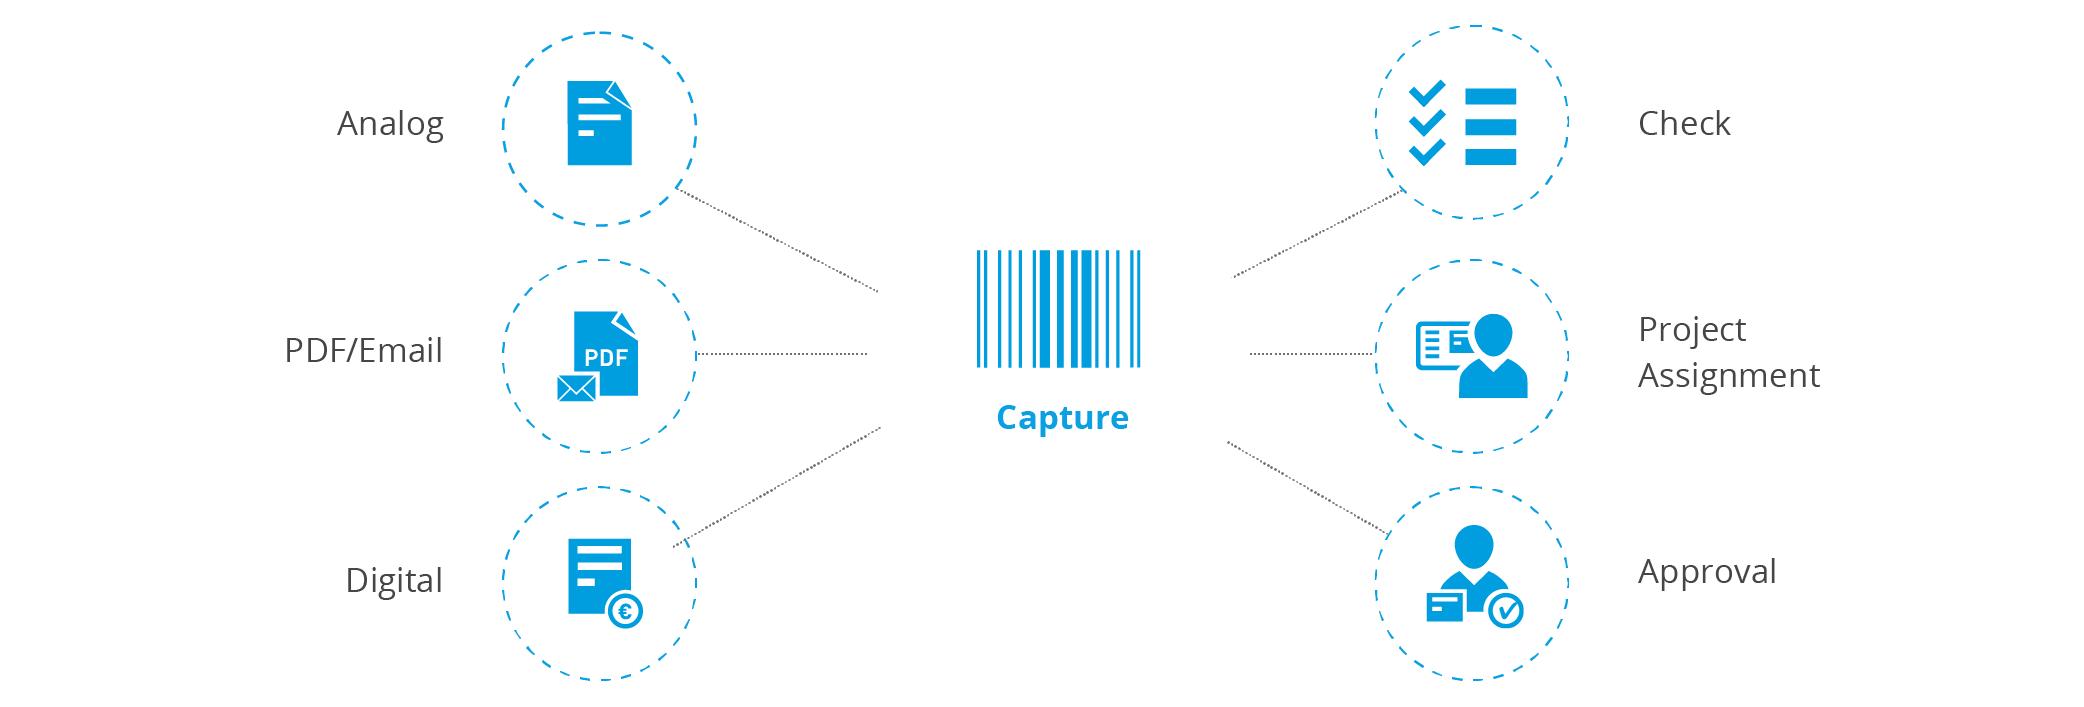 Procurement process - Capture